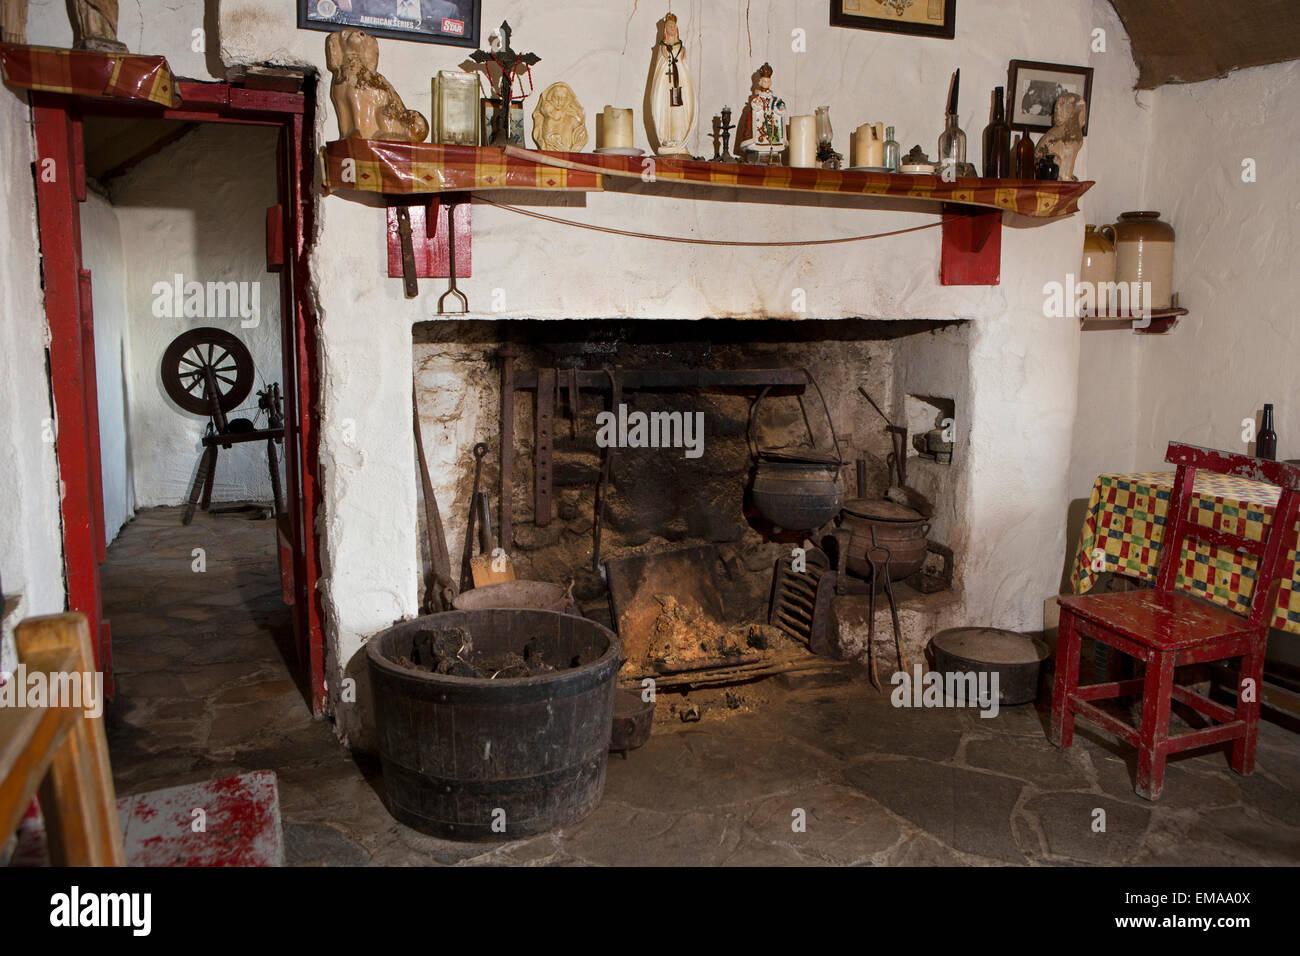 Ireland Co Galway Connemara Heritage Amp History Centre